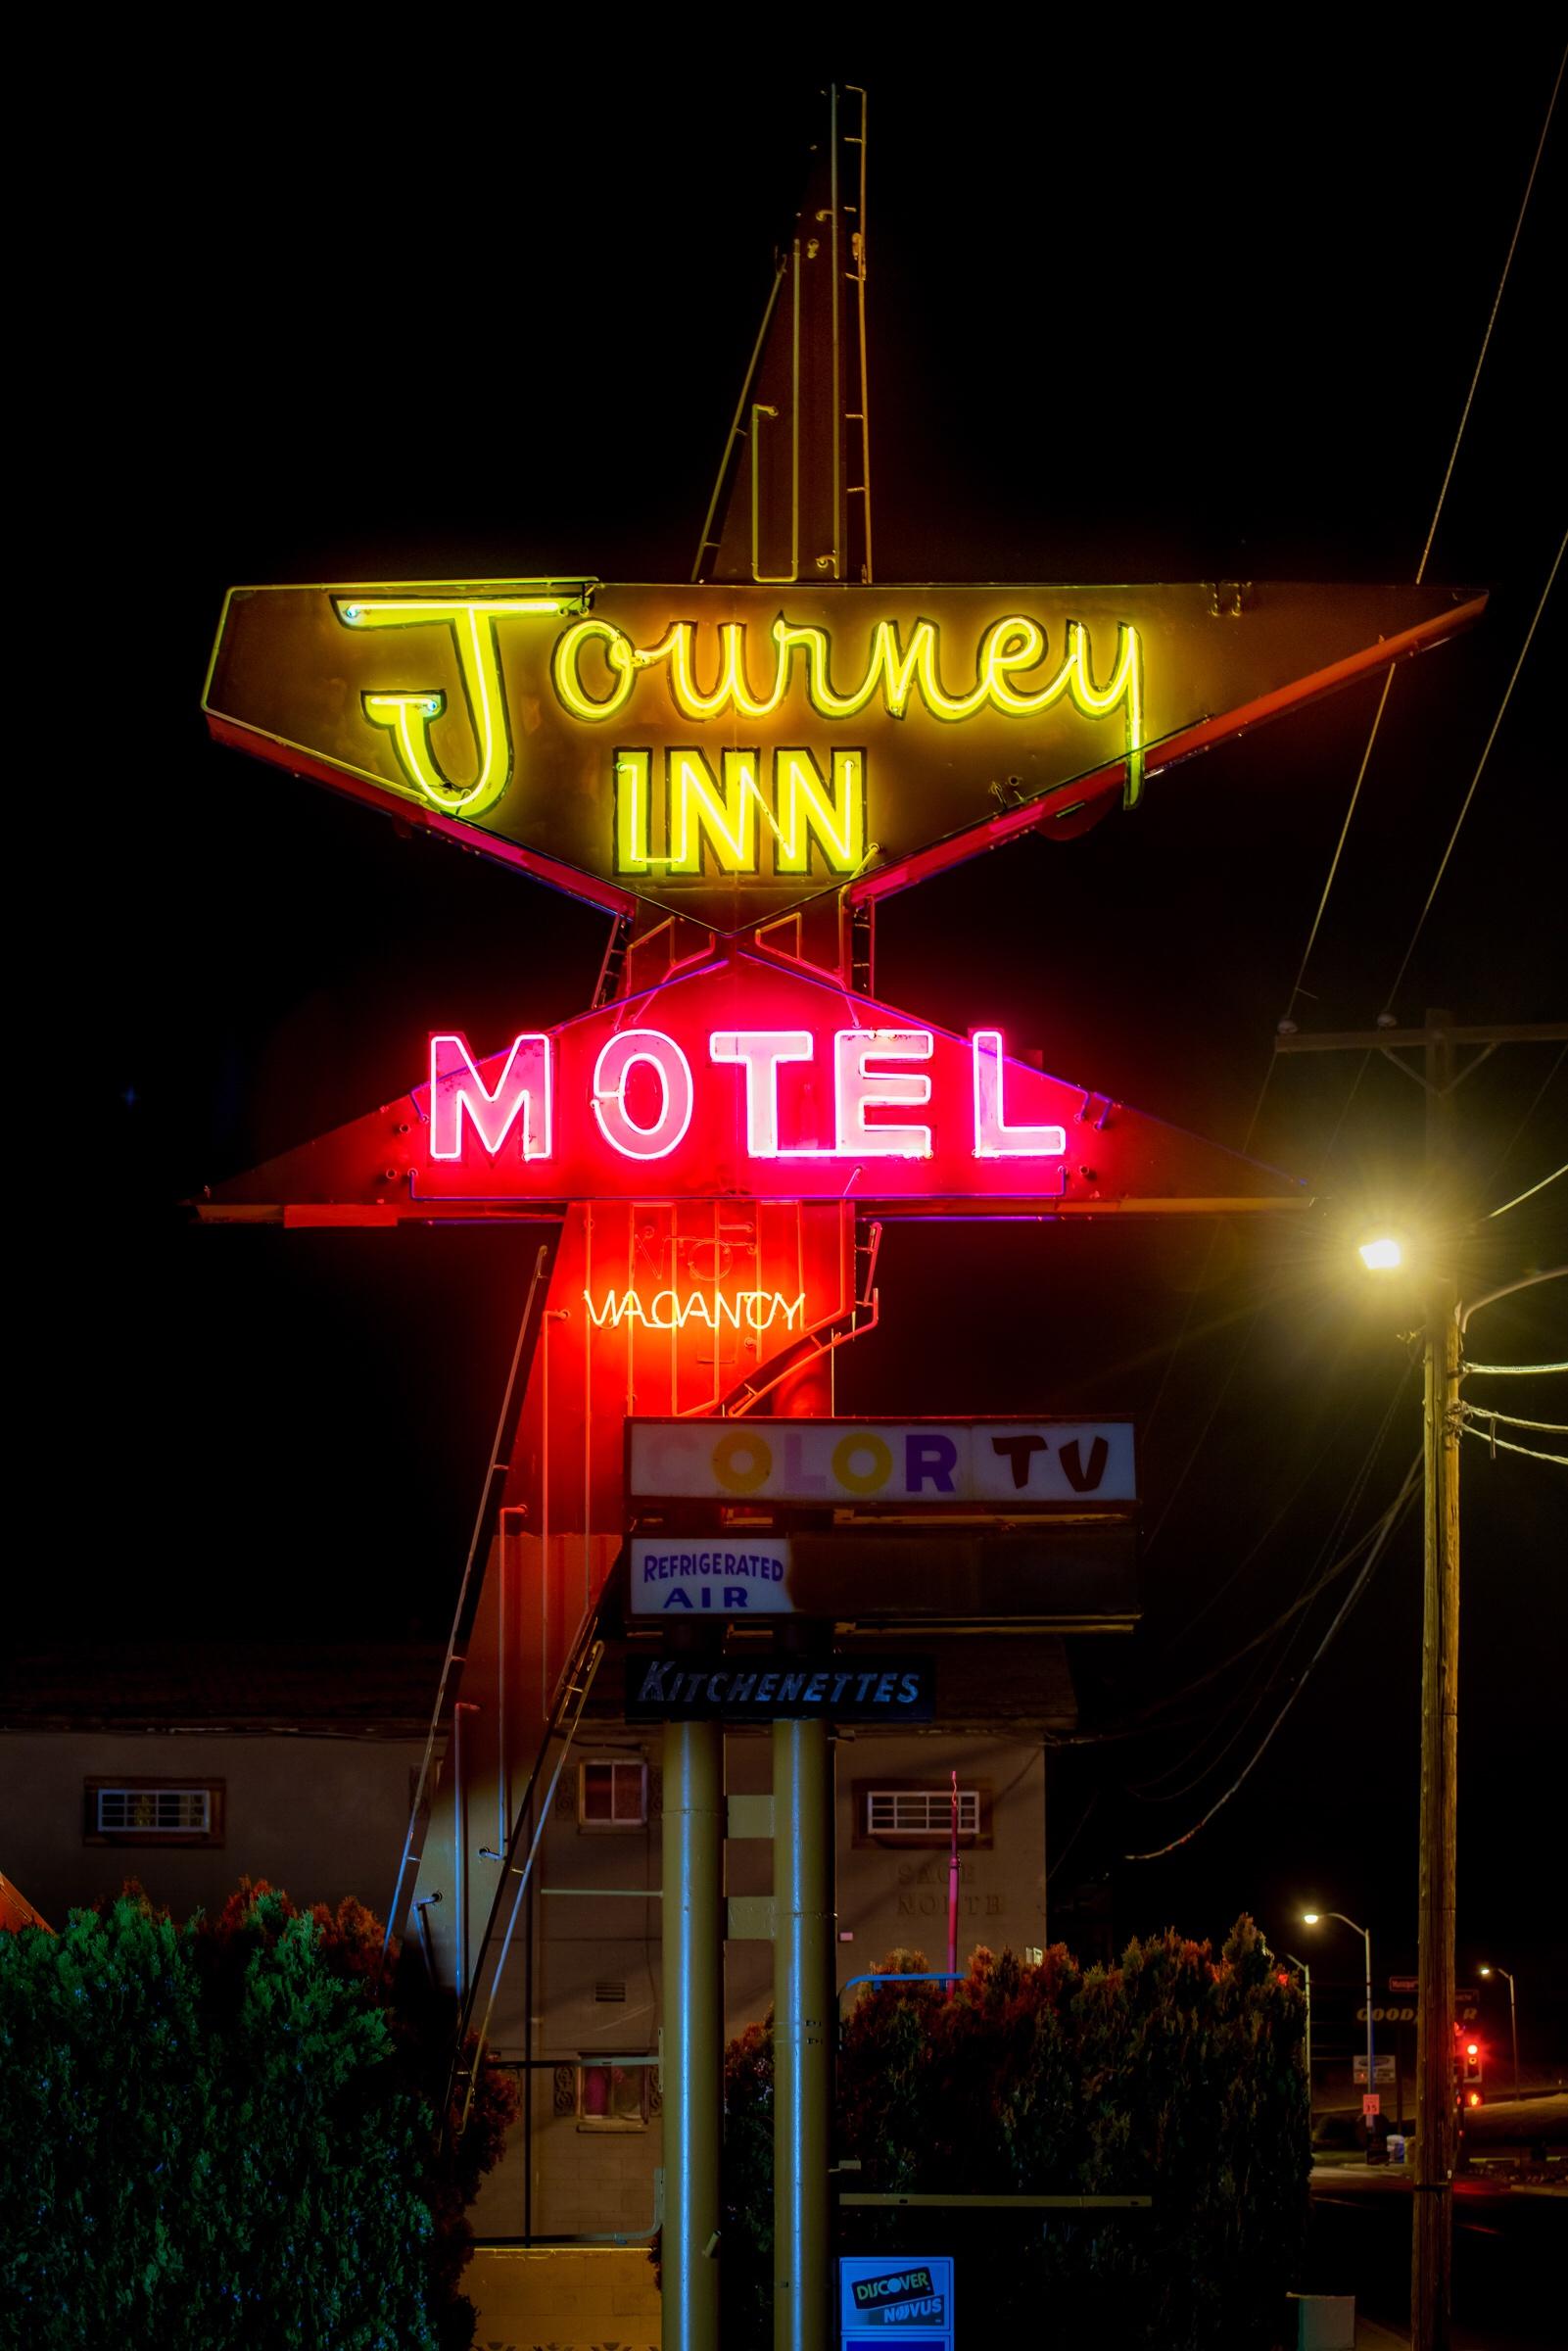 Journey Inn - 317 Airport Drive, Farmington, New Mexico U.S.A. - June 14, 2016